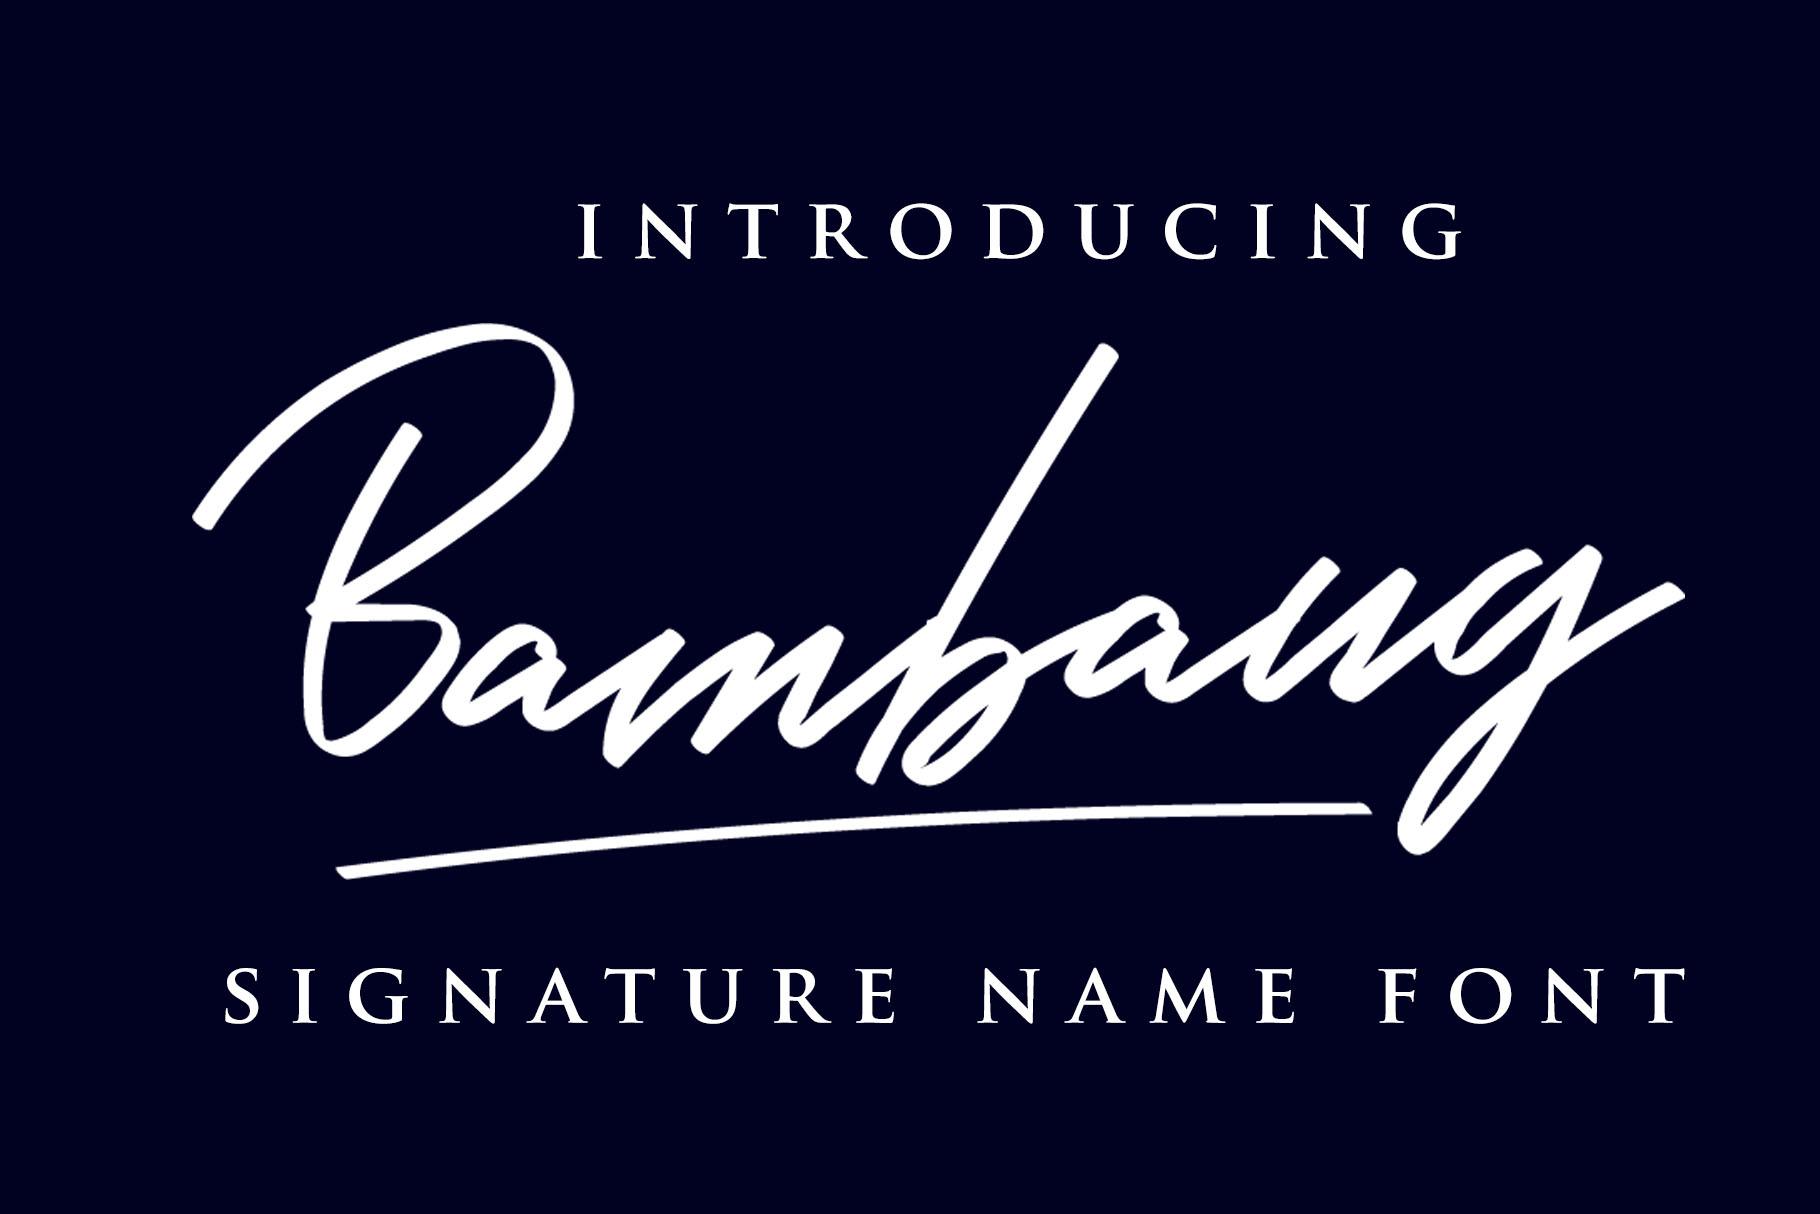 Bambang - Signature Font example image 5